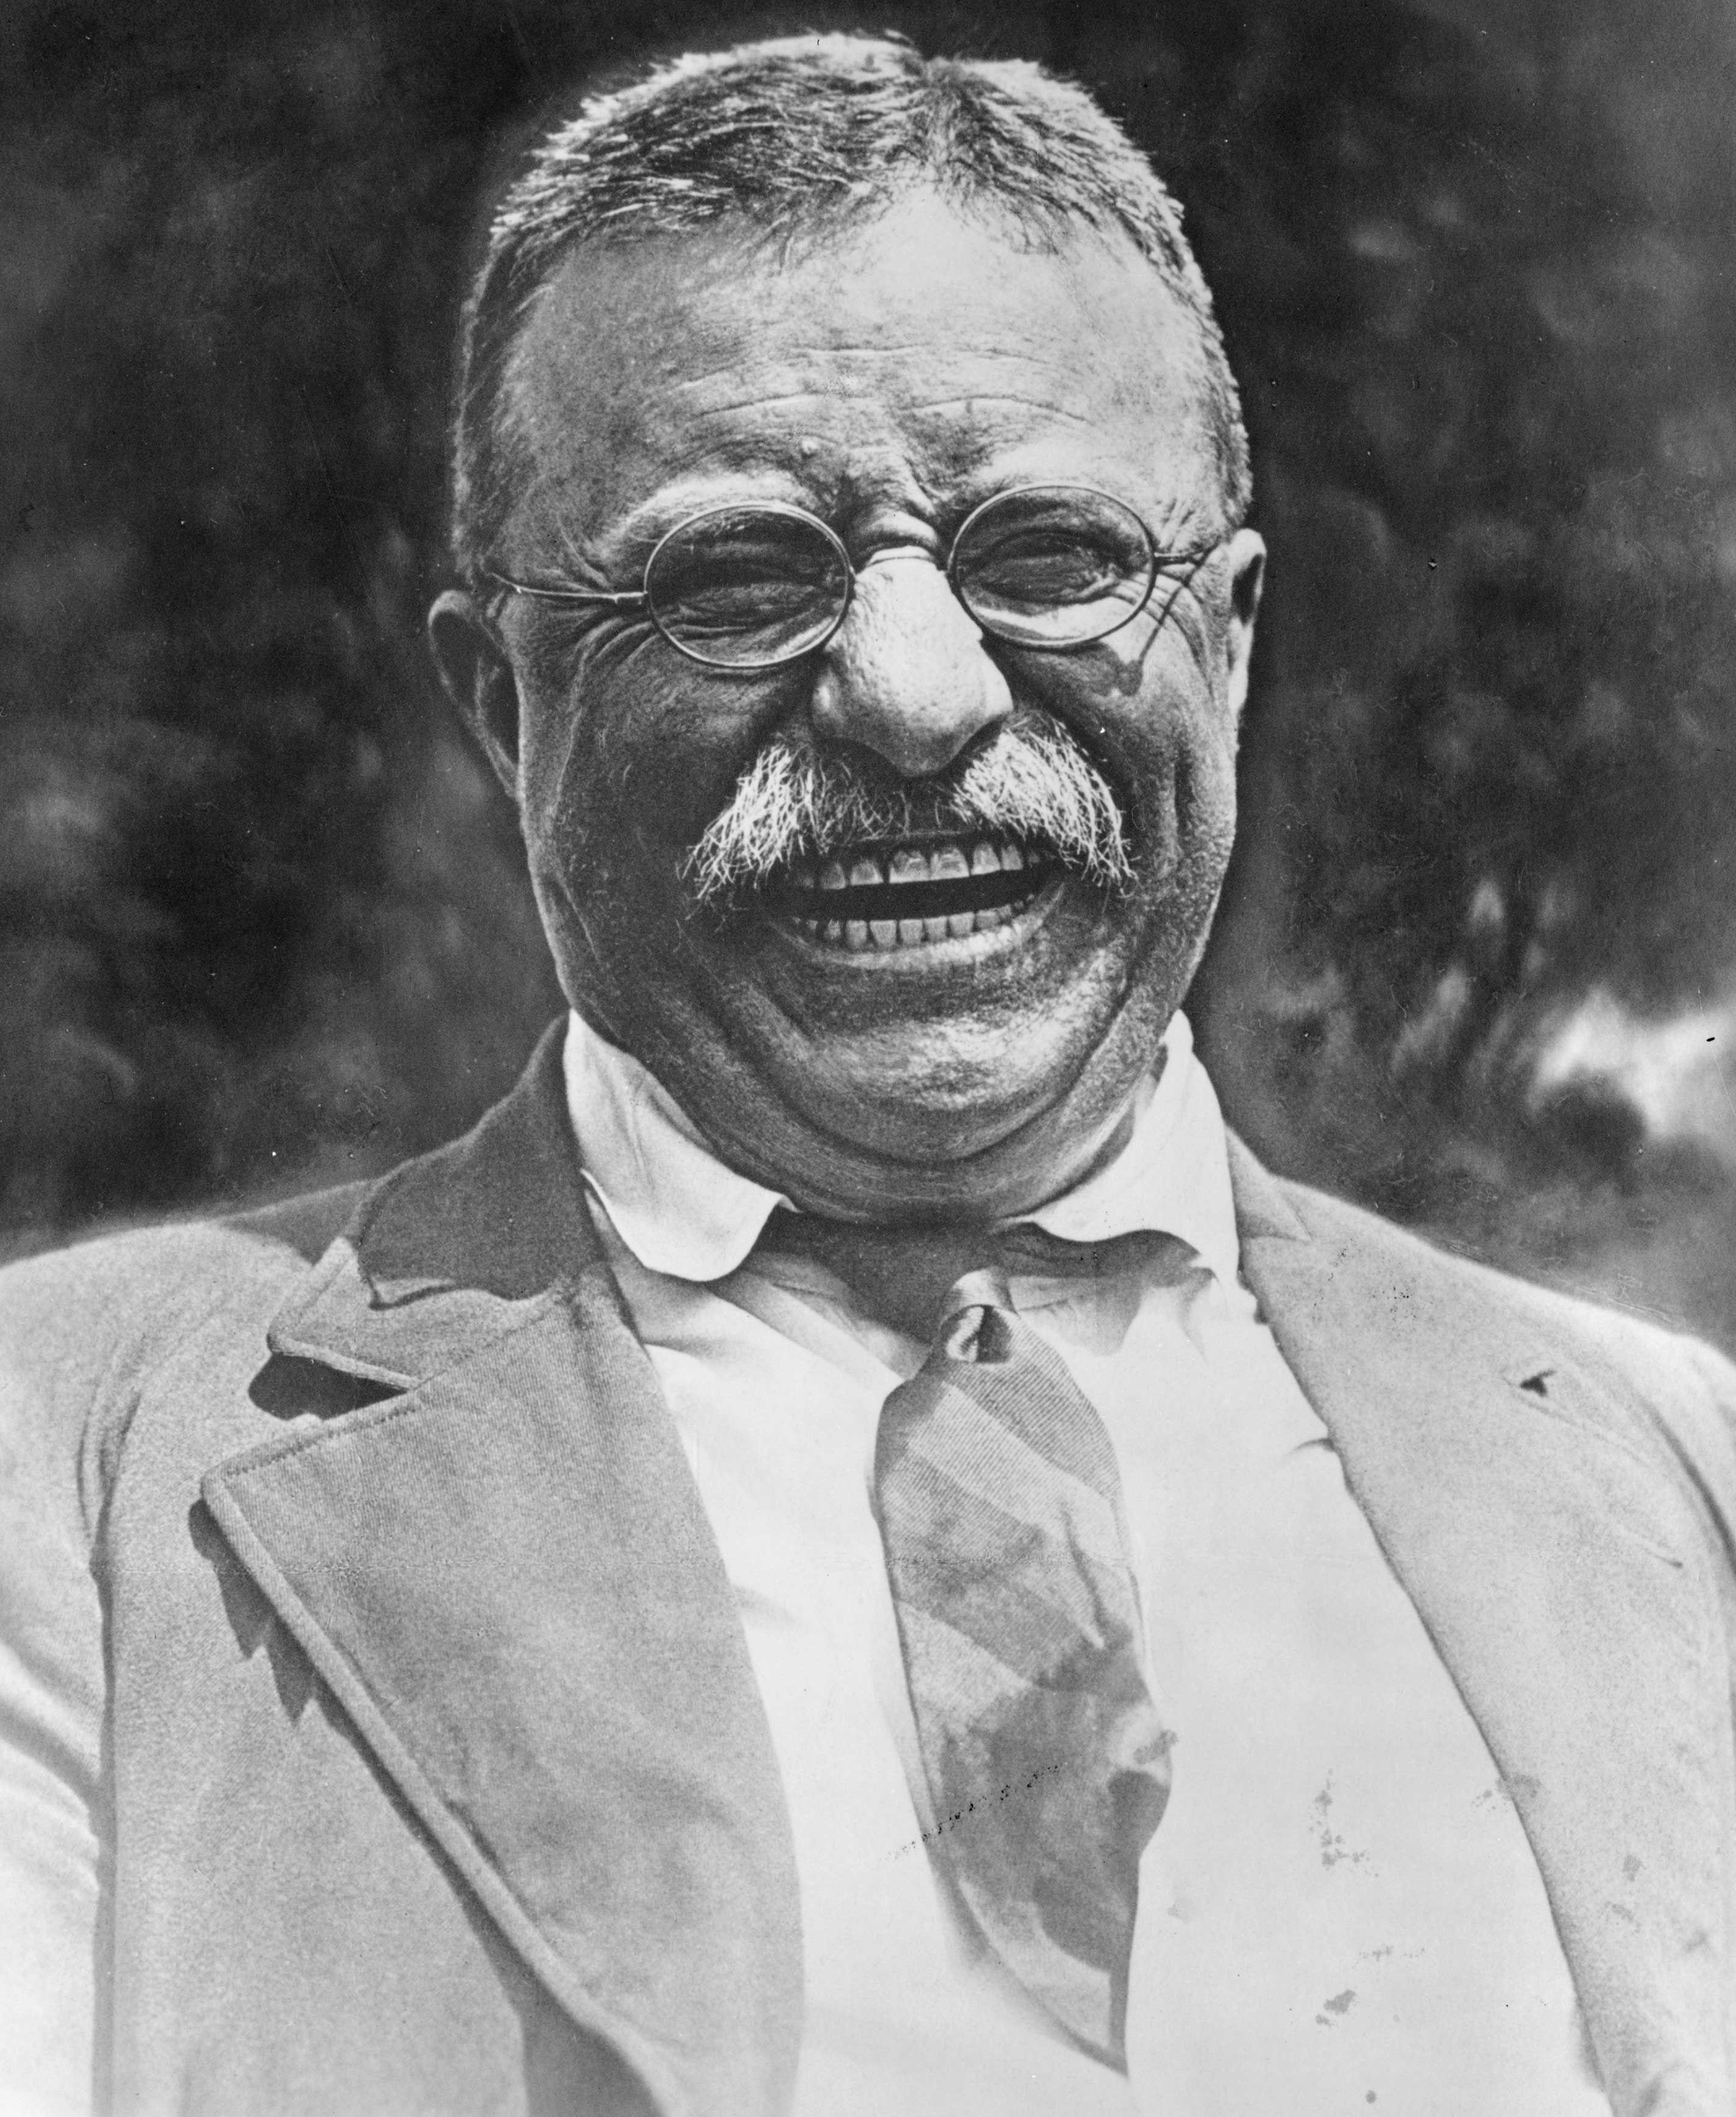 21 Impressive Theodore Roosevelt Pictures